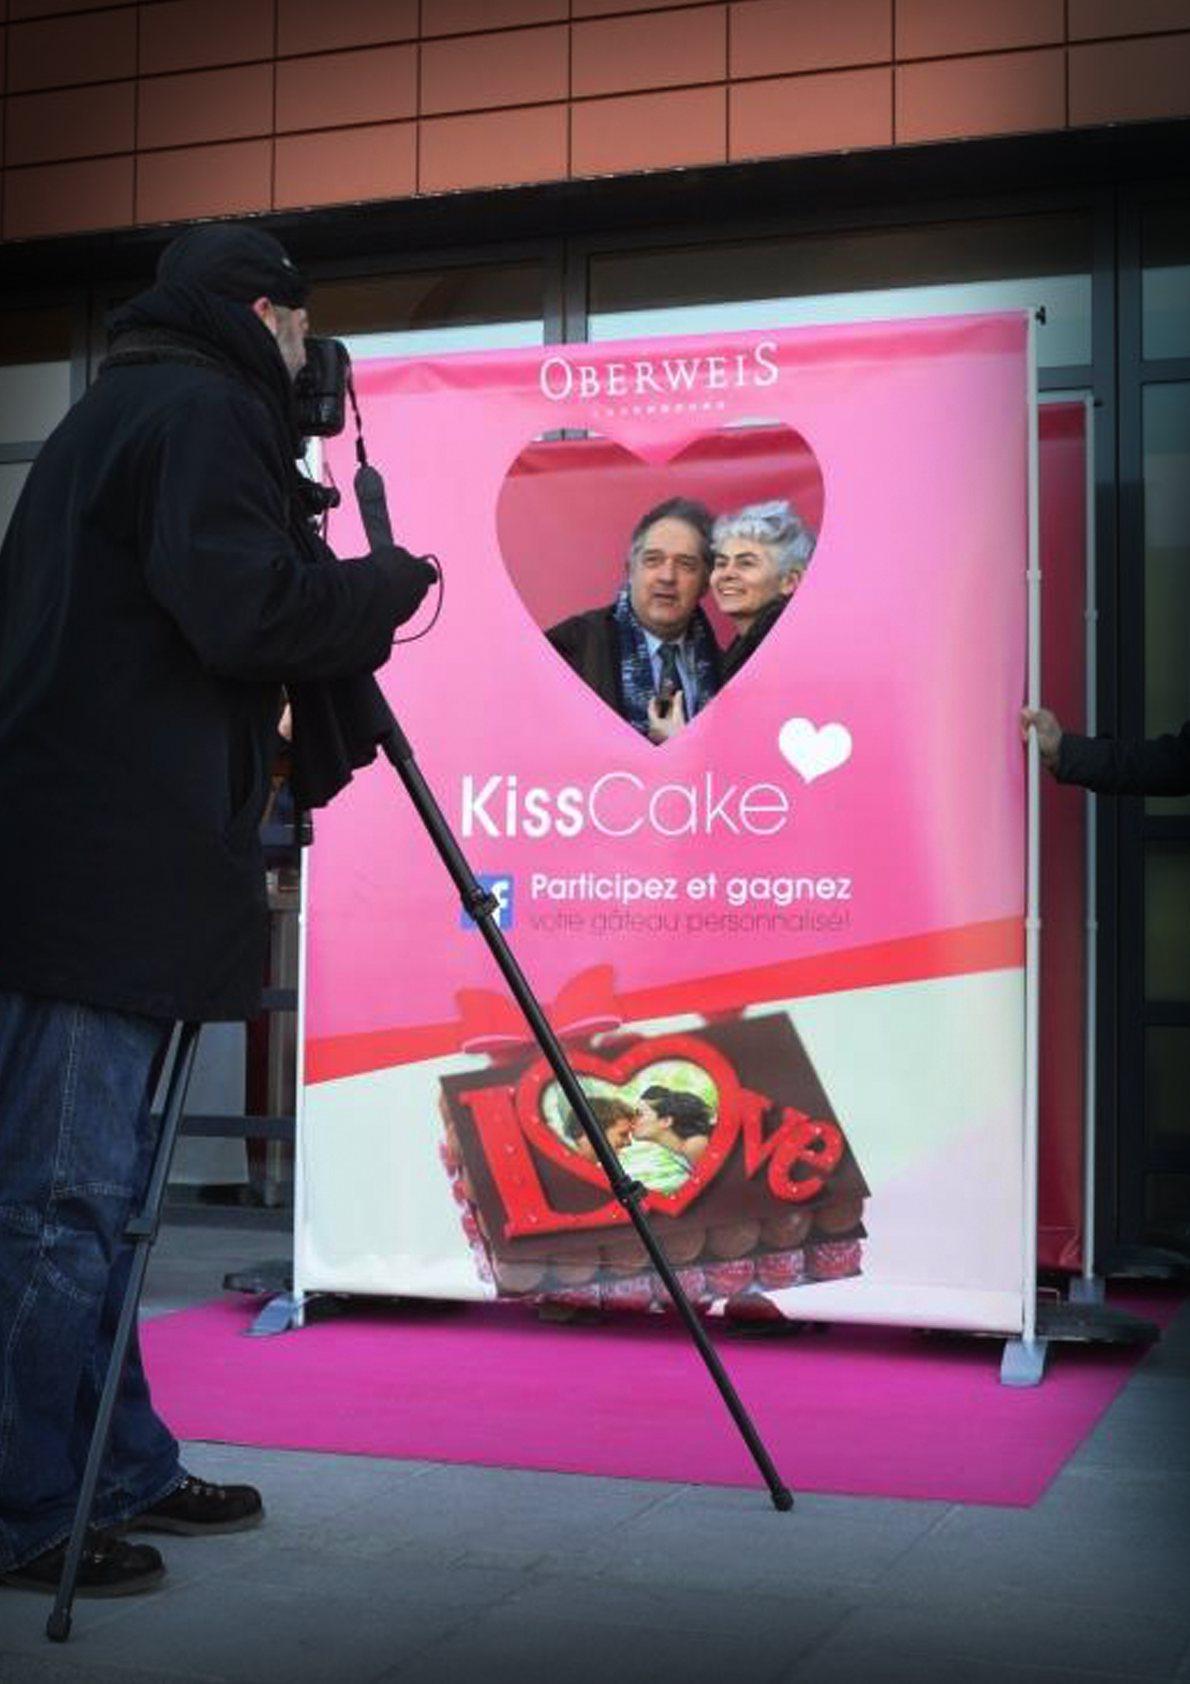 Oberweis Valentine S Day Kisscake Photoshoot Binsfeld